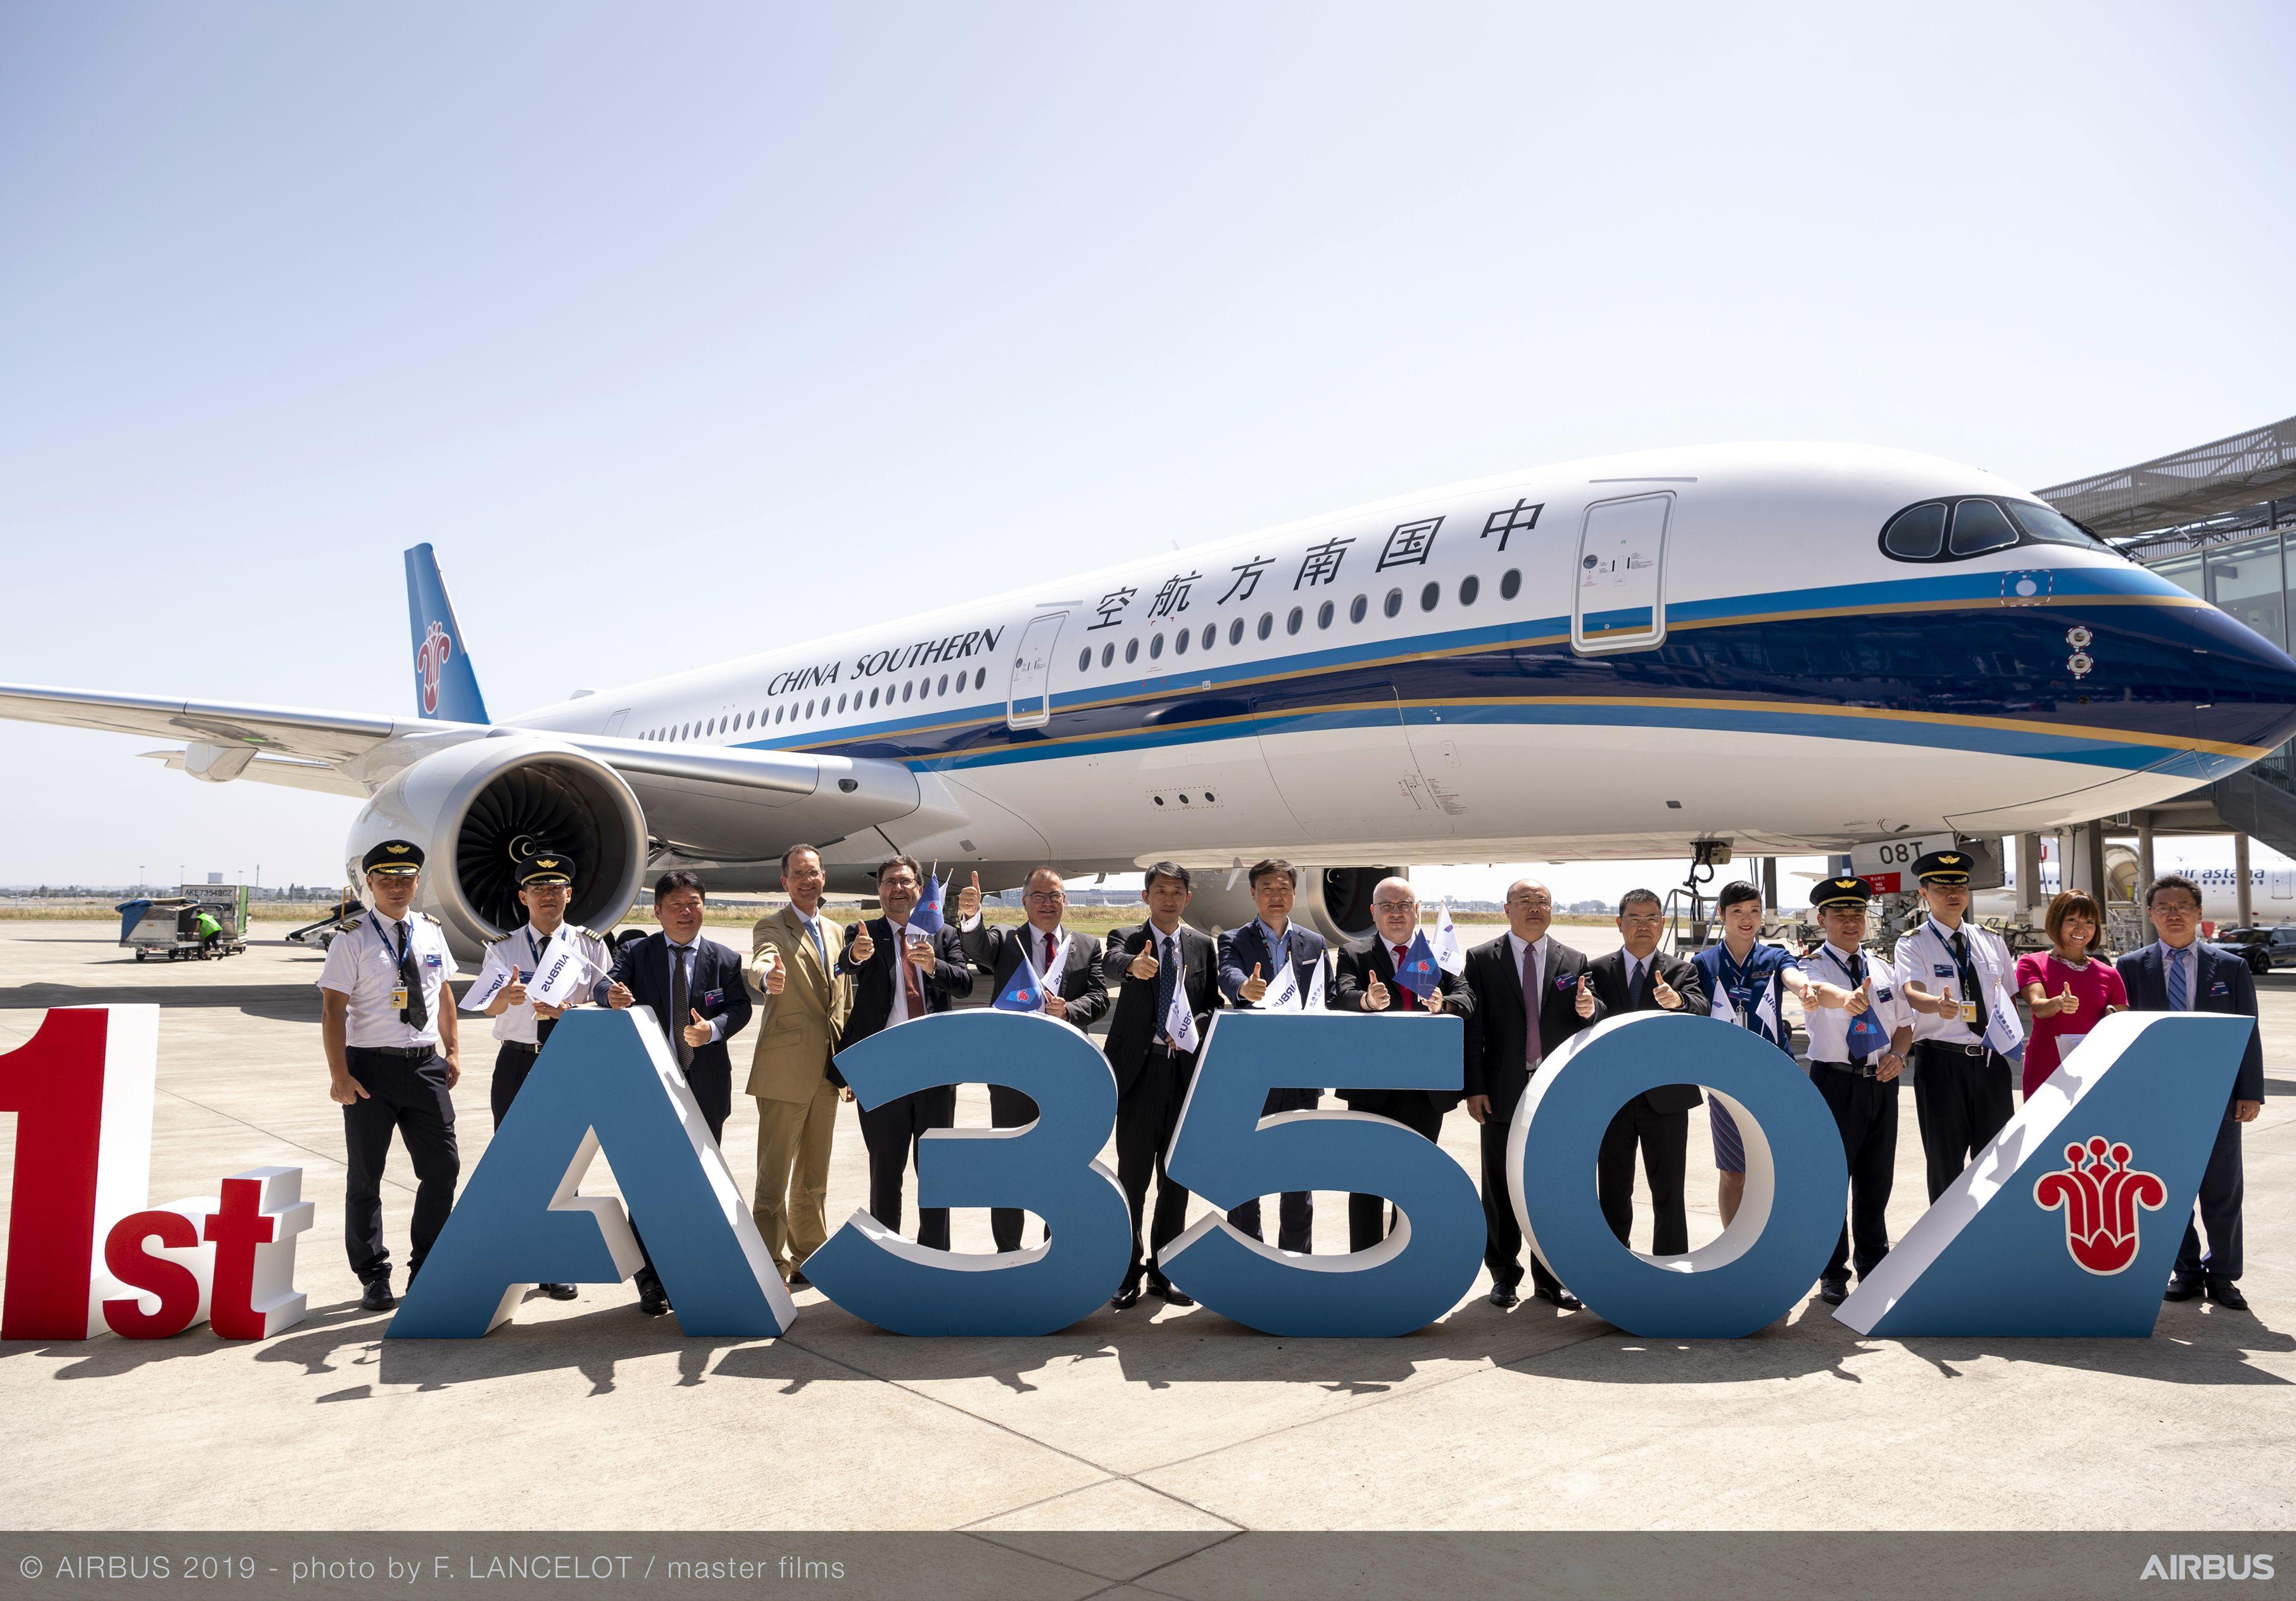 Photo gallery - Galleries - Airbus